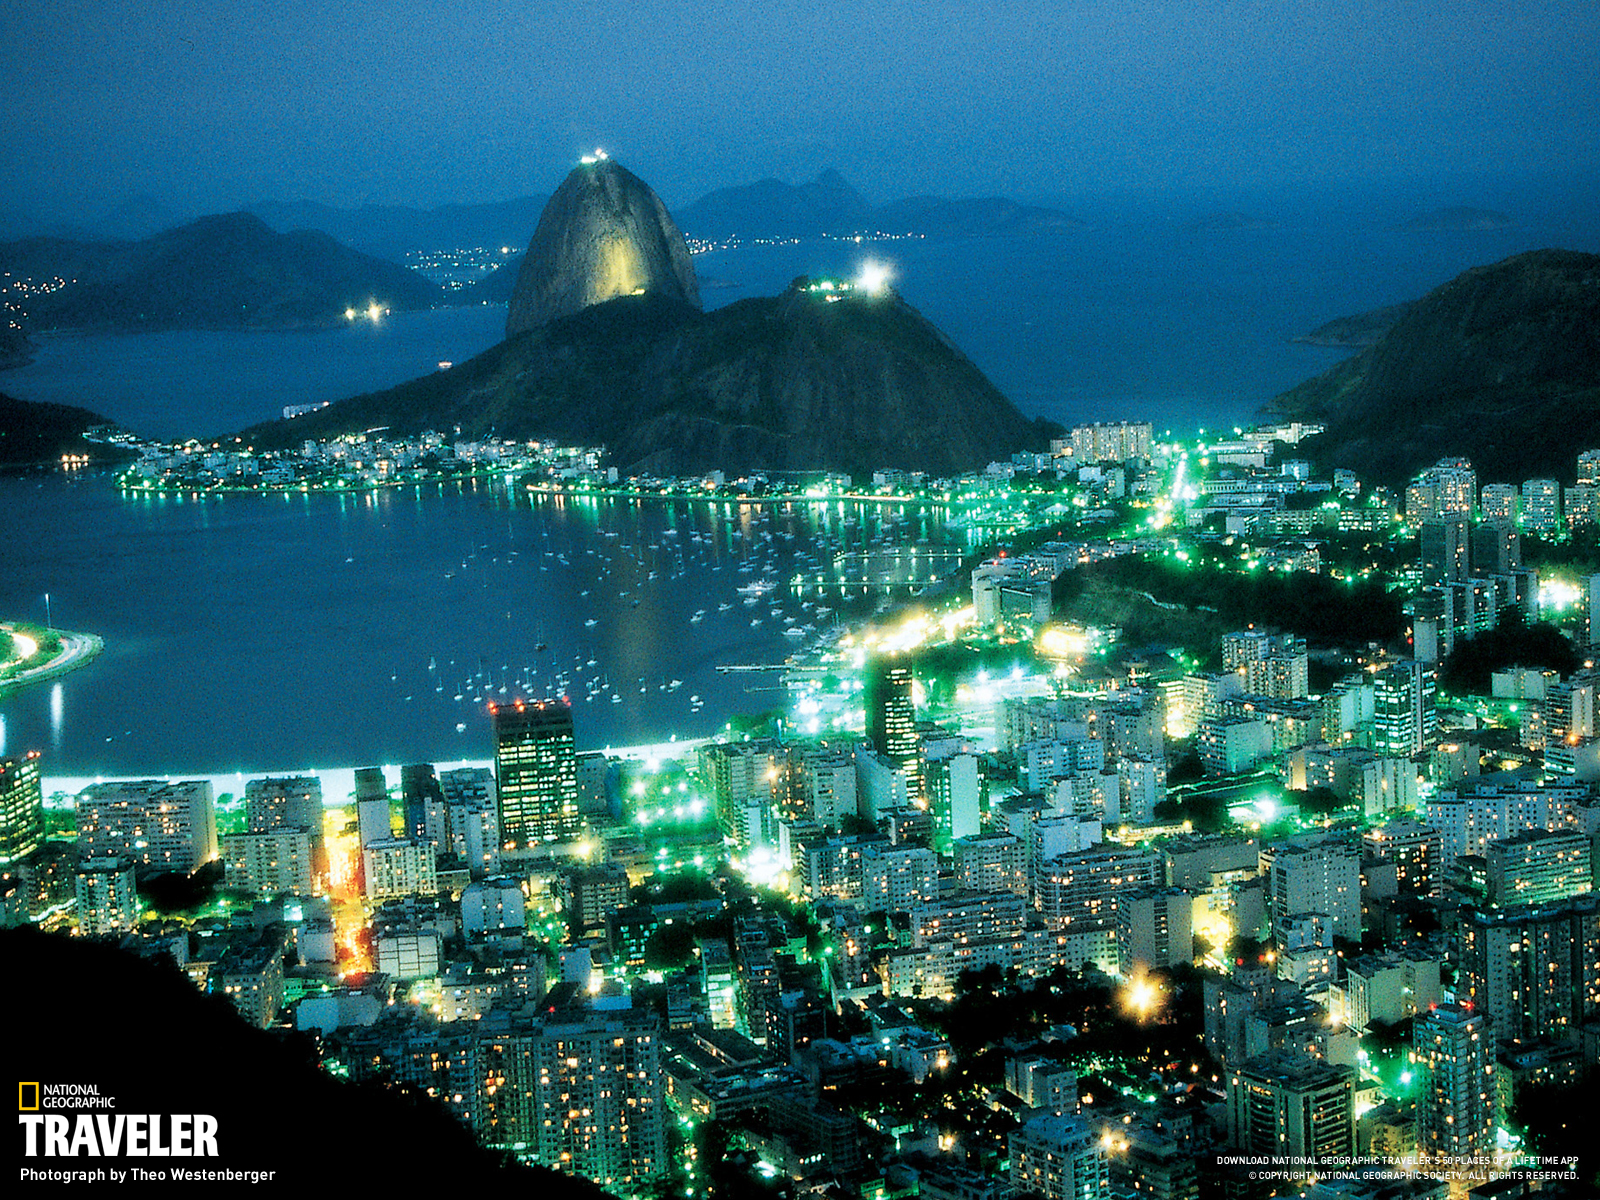 New Rio de Janeiro background Cities wallpapers 1600x1200